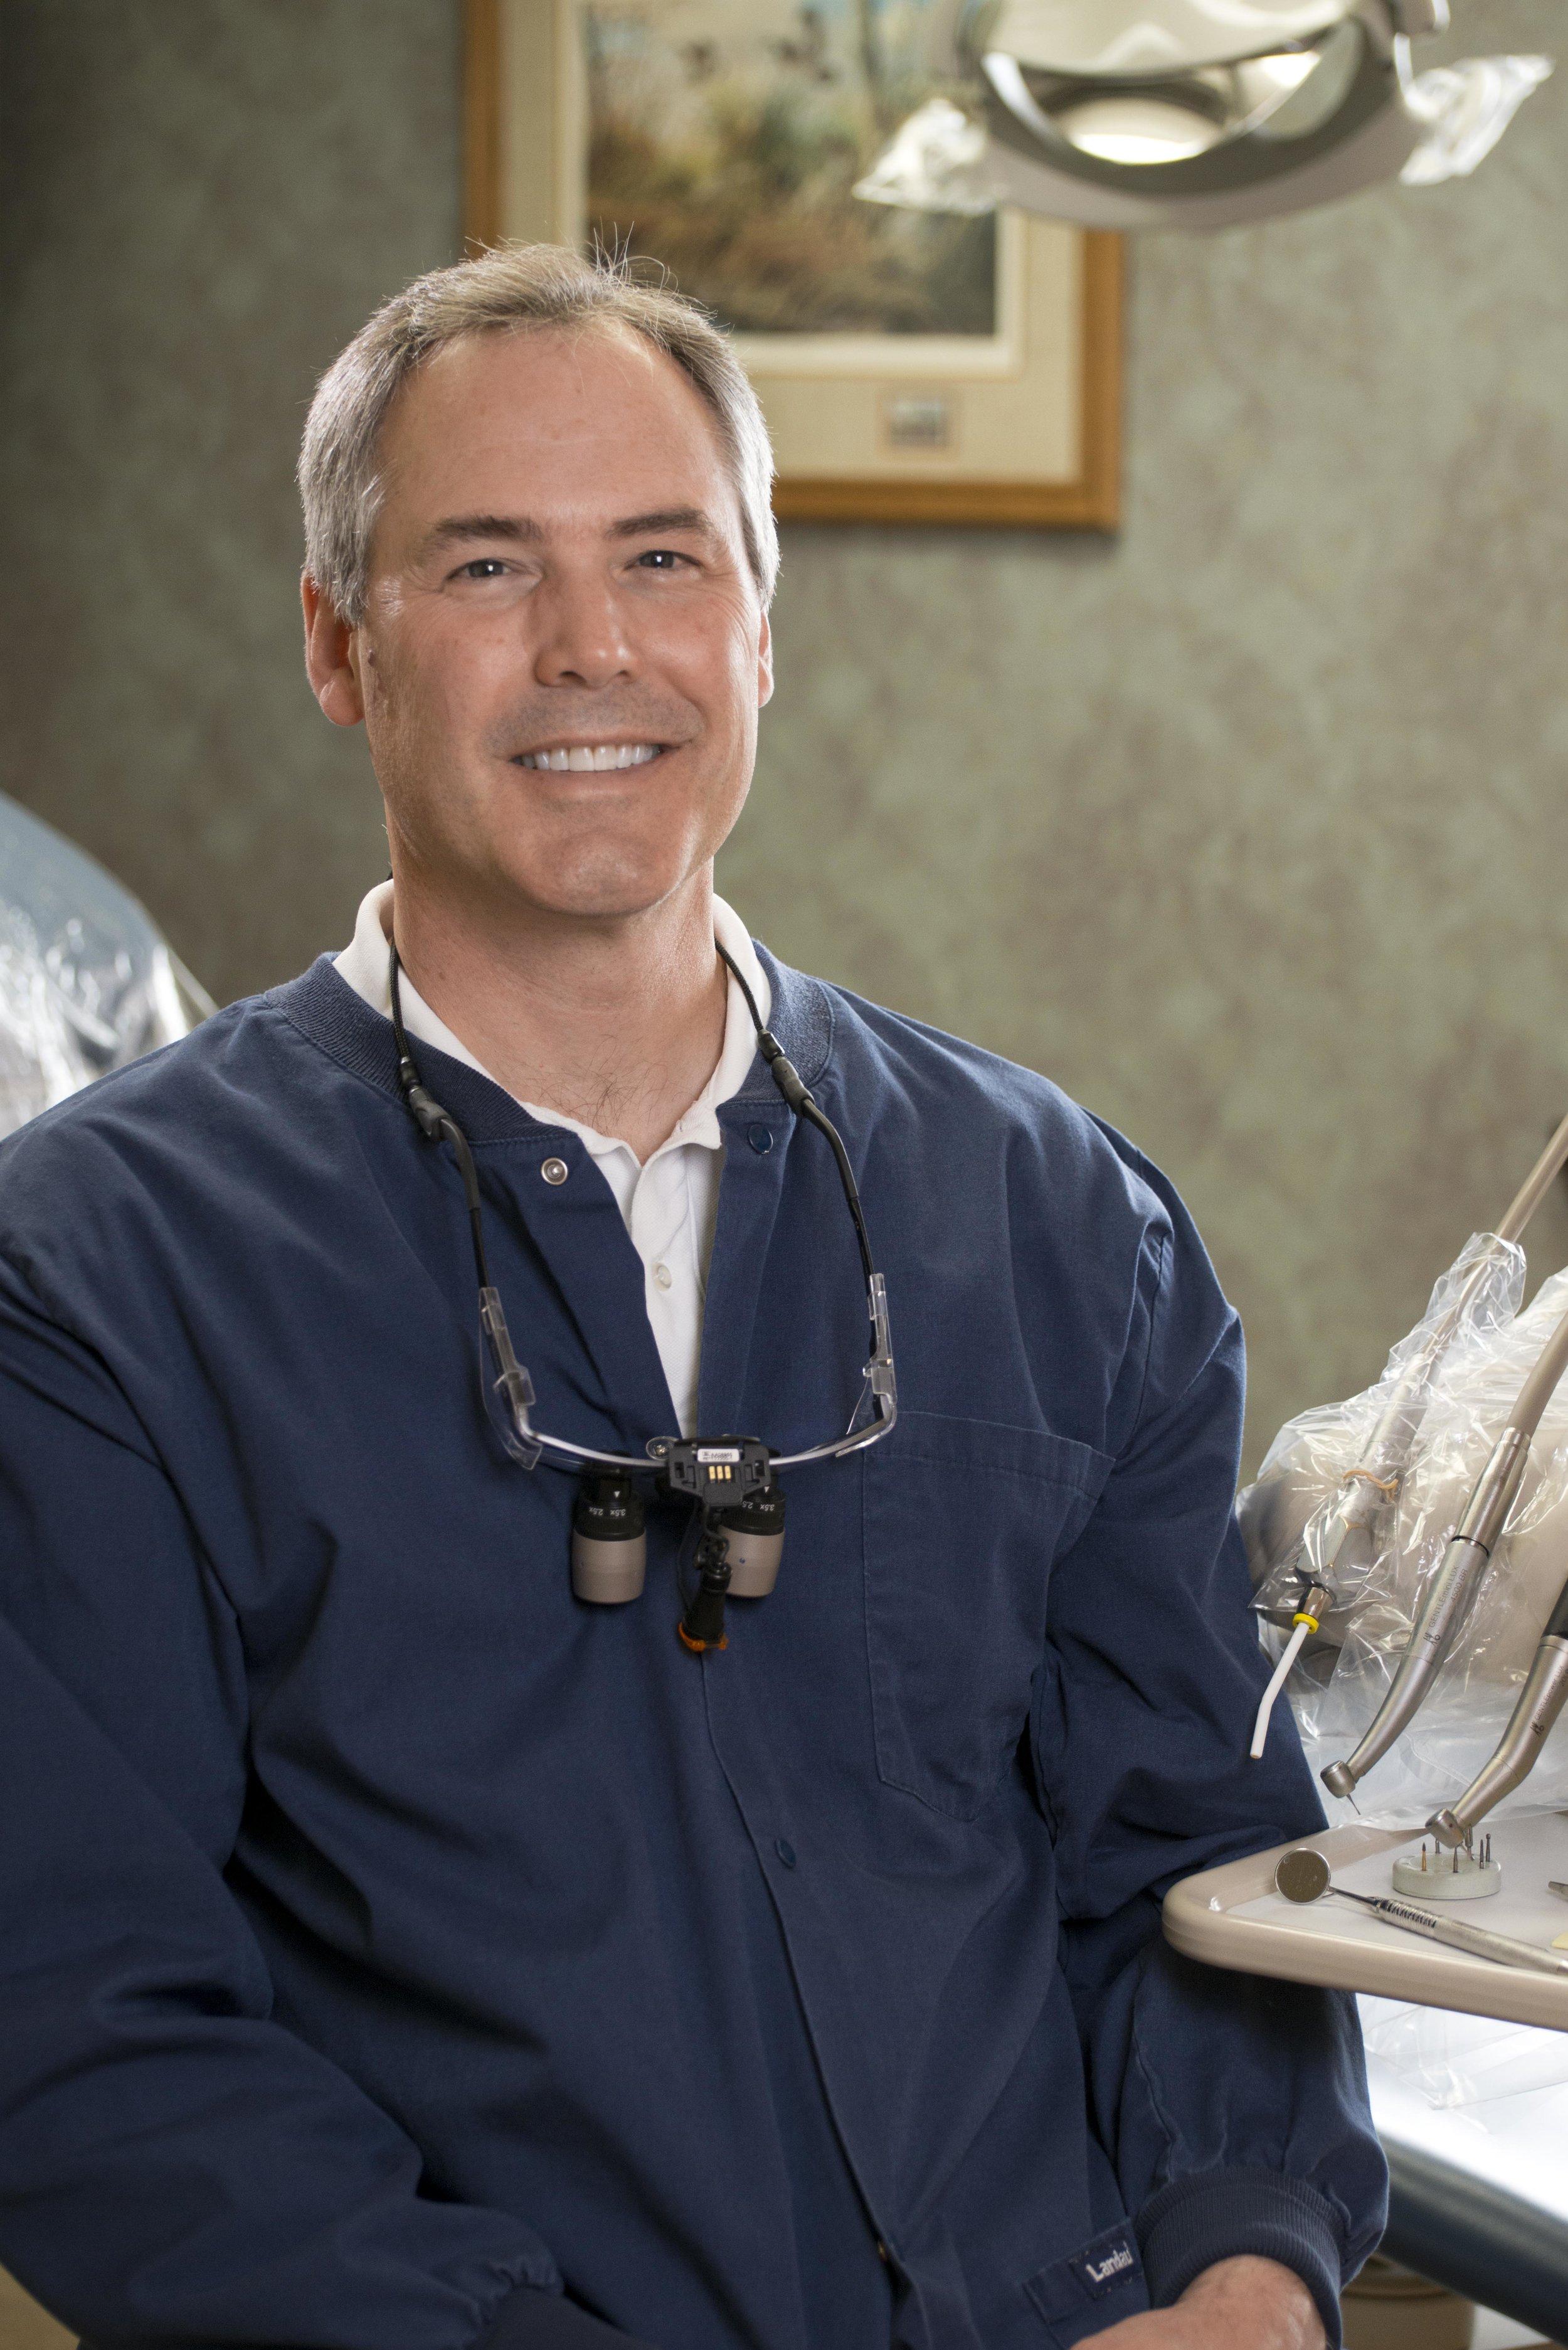 Dr. Daniel McKinney